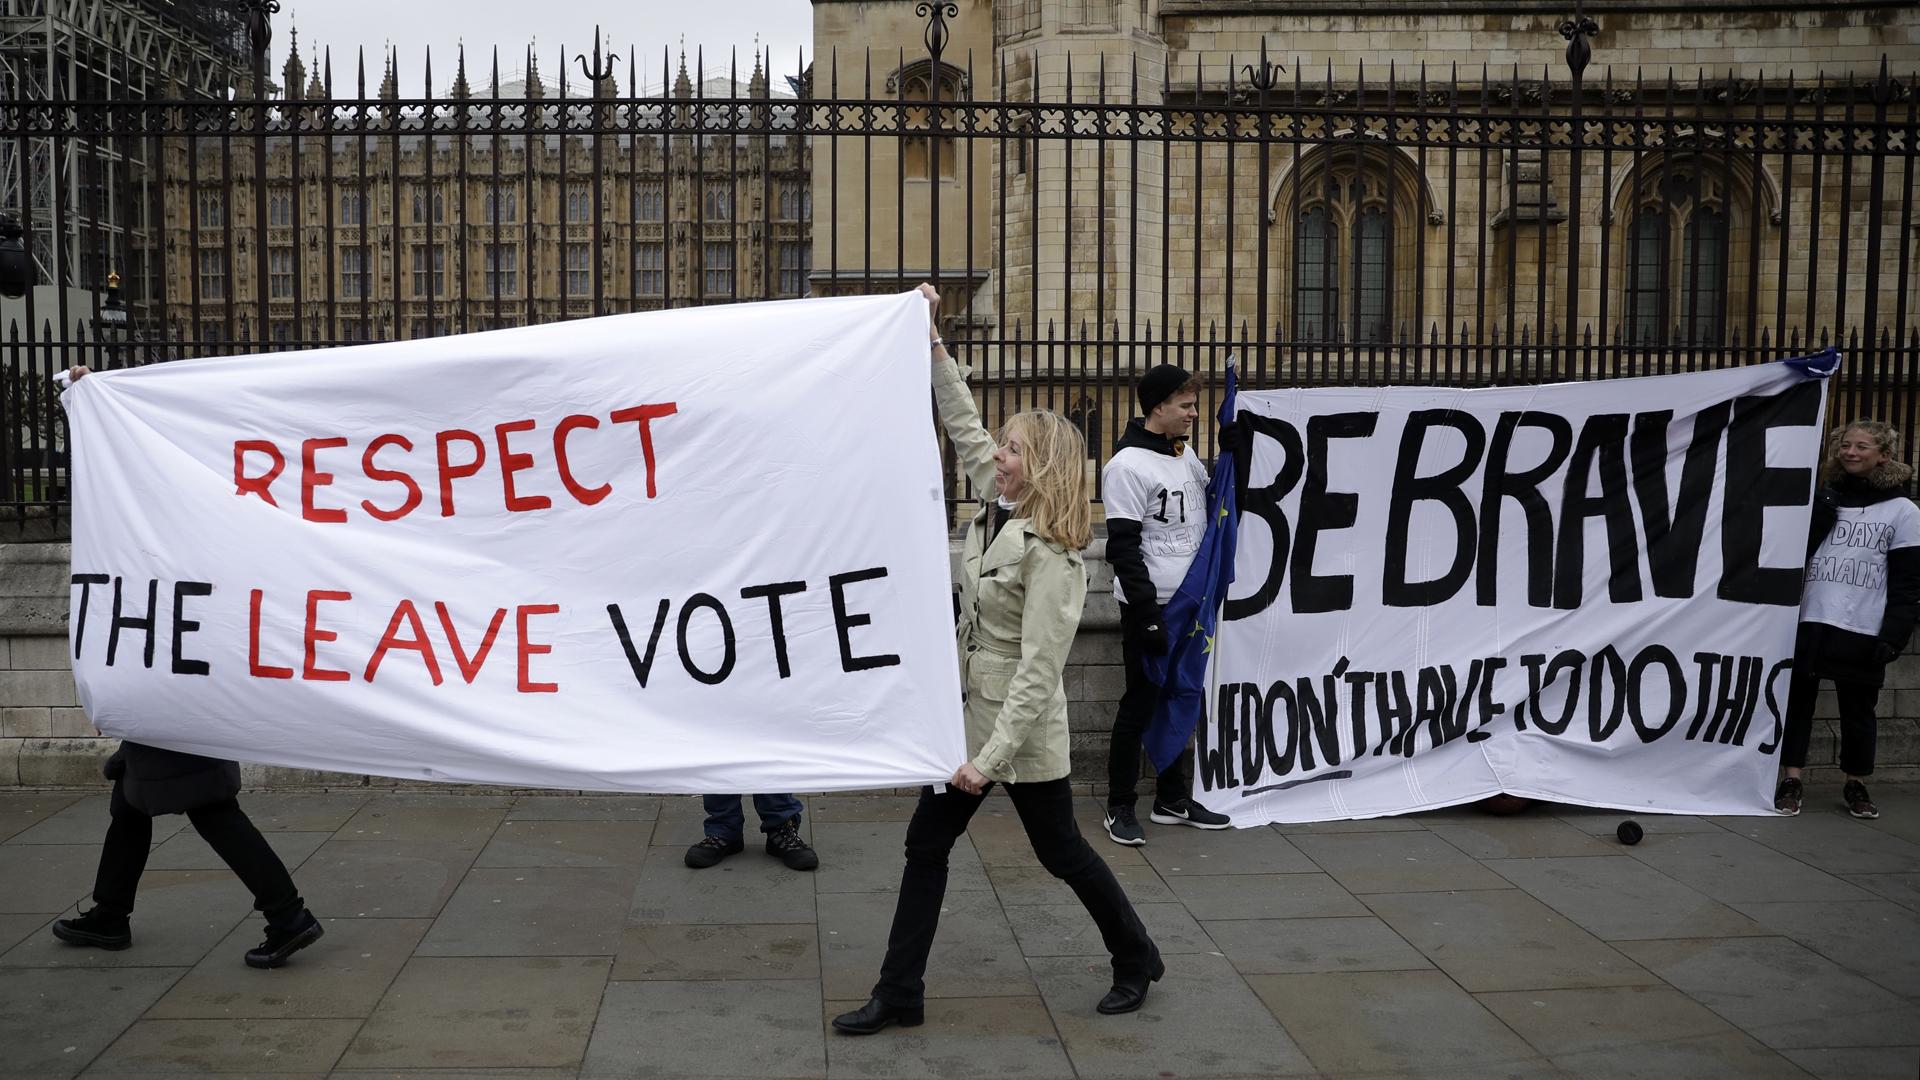 Britain Brexit protesters 031219 AP_1552442647004